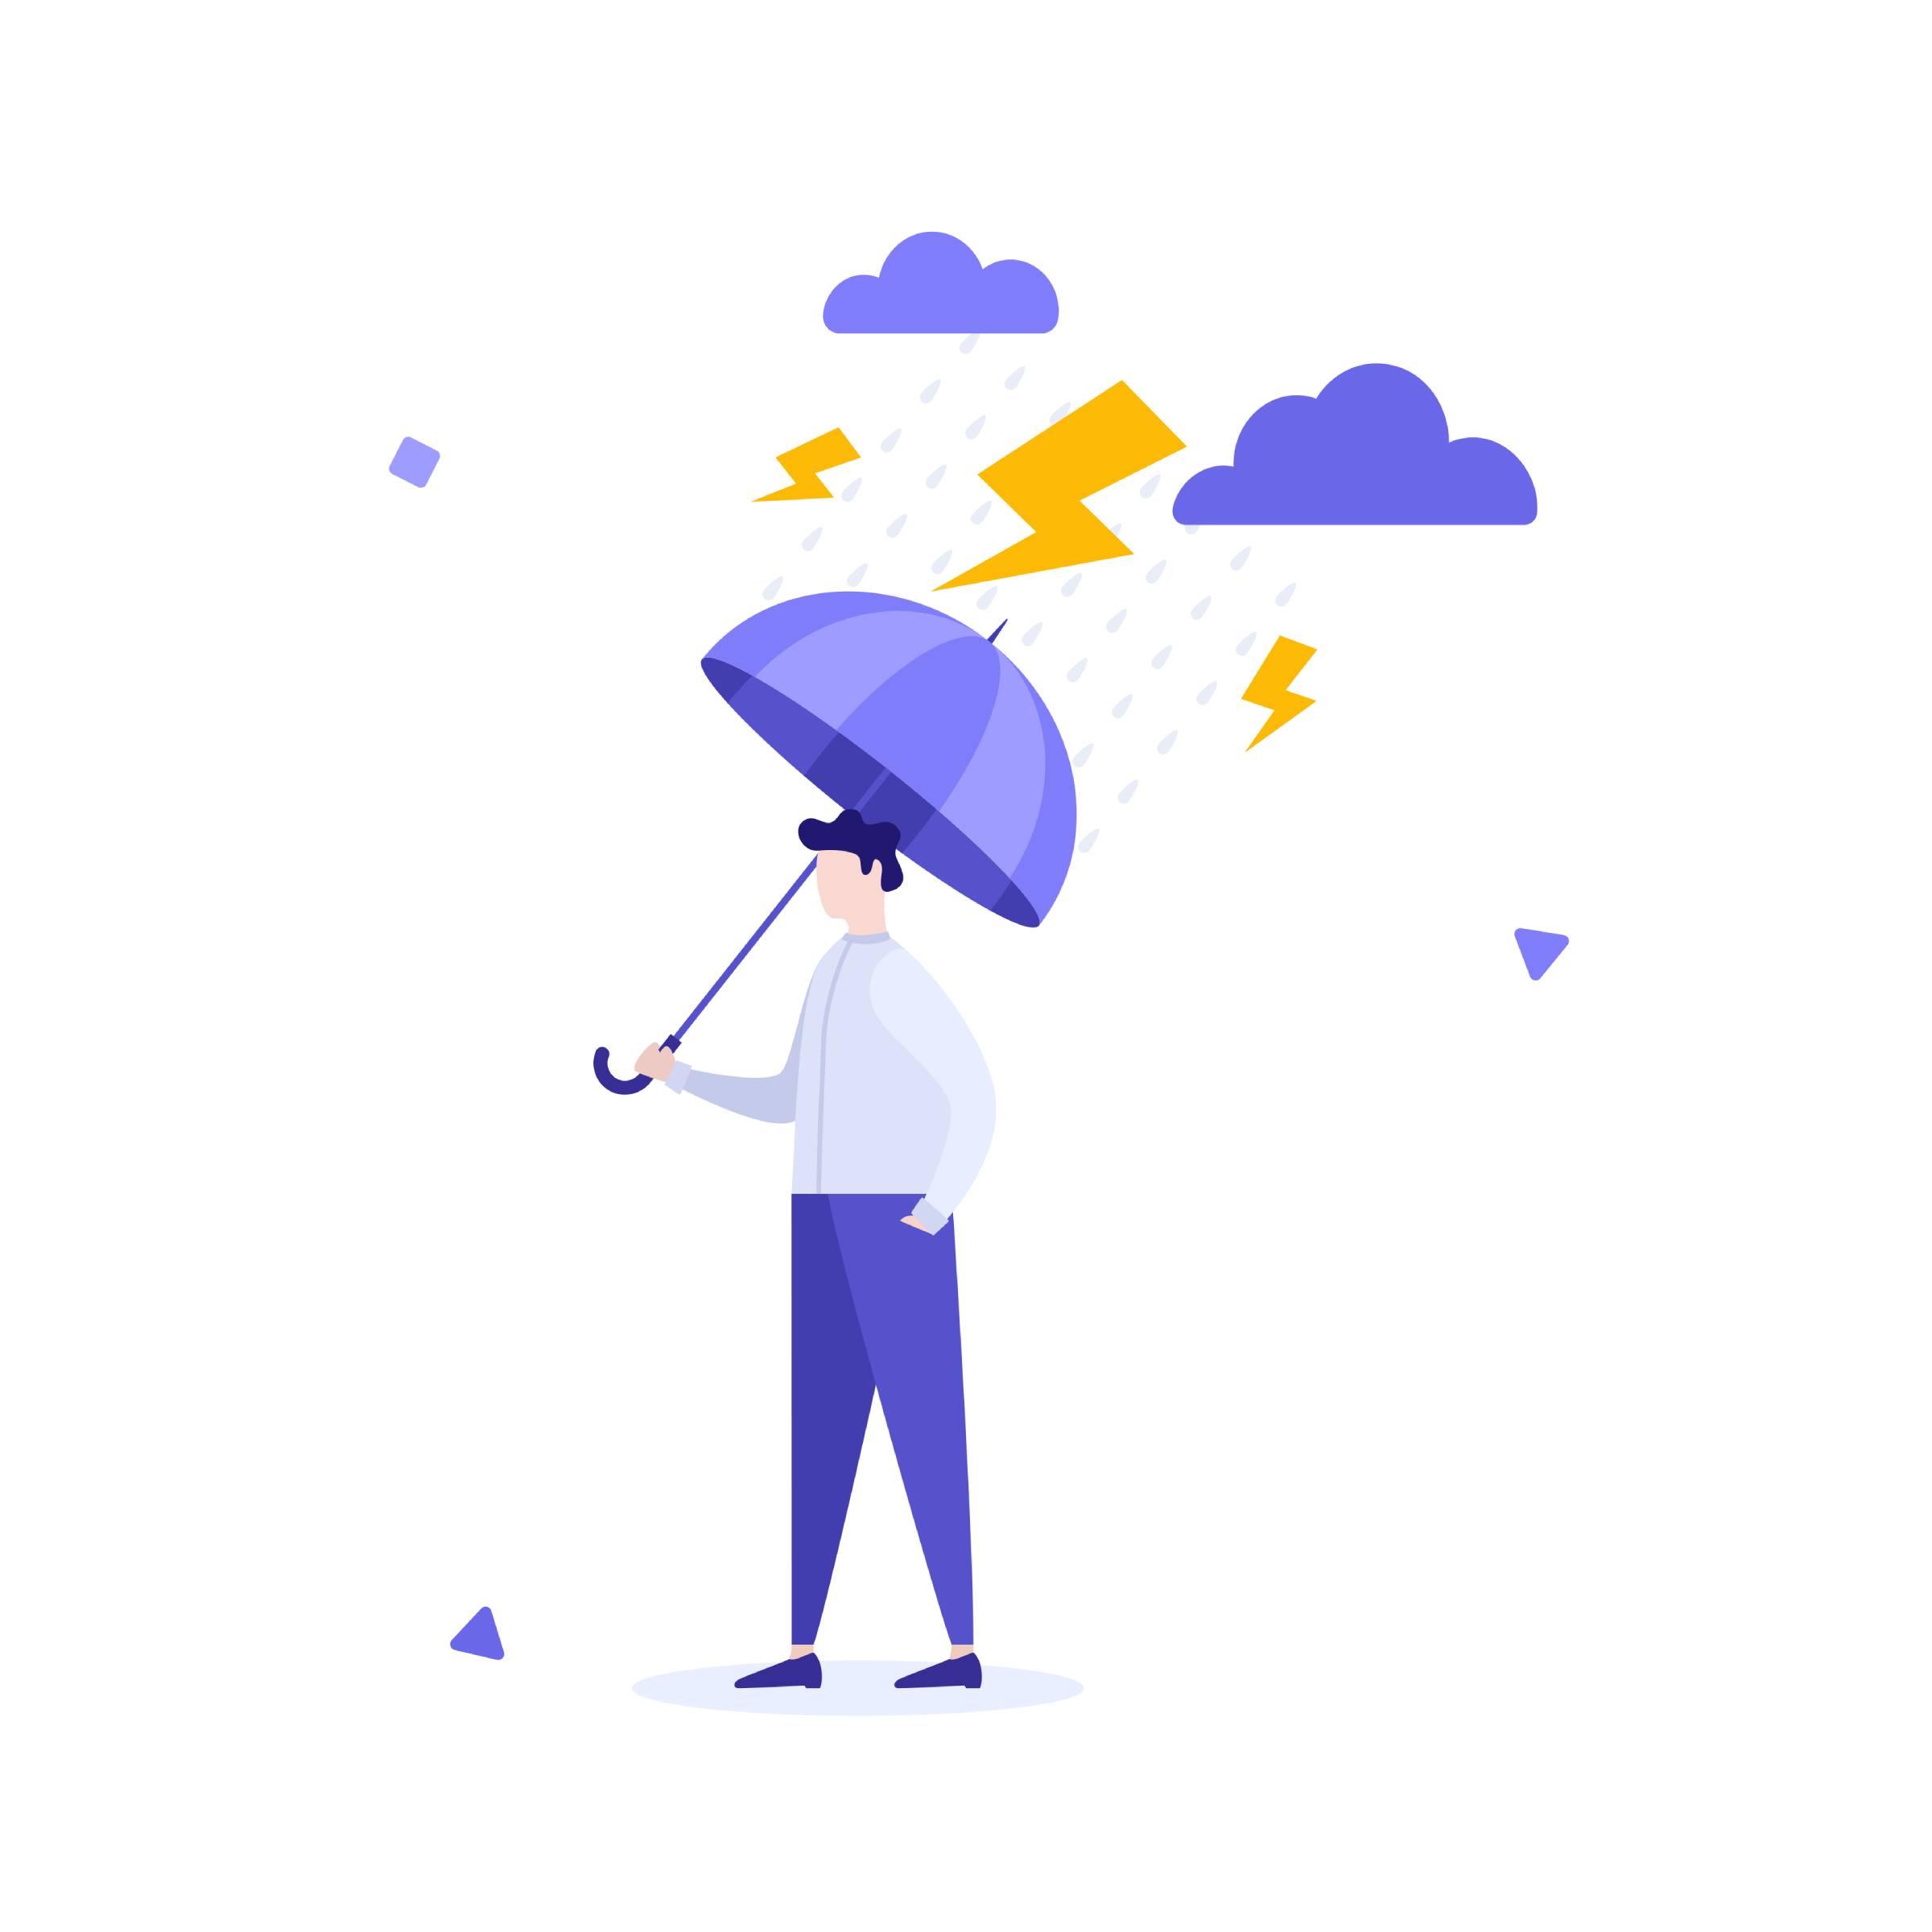 Illustration of a man holding an umbrella